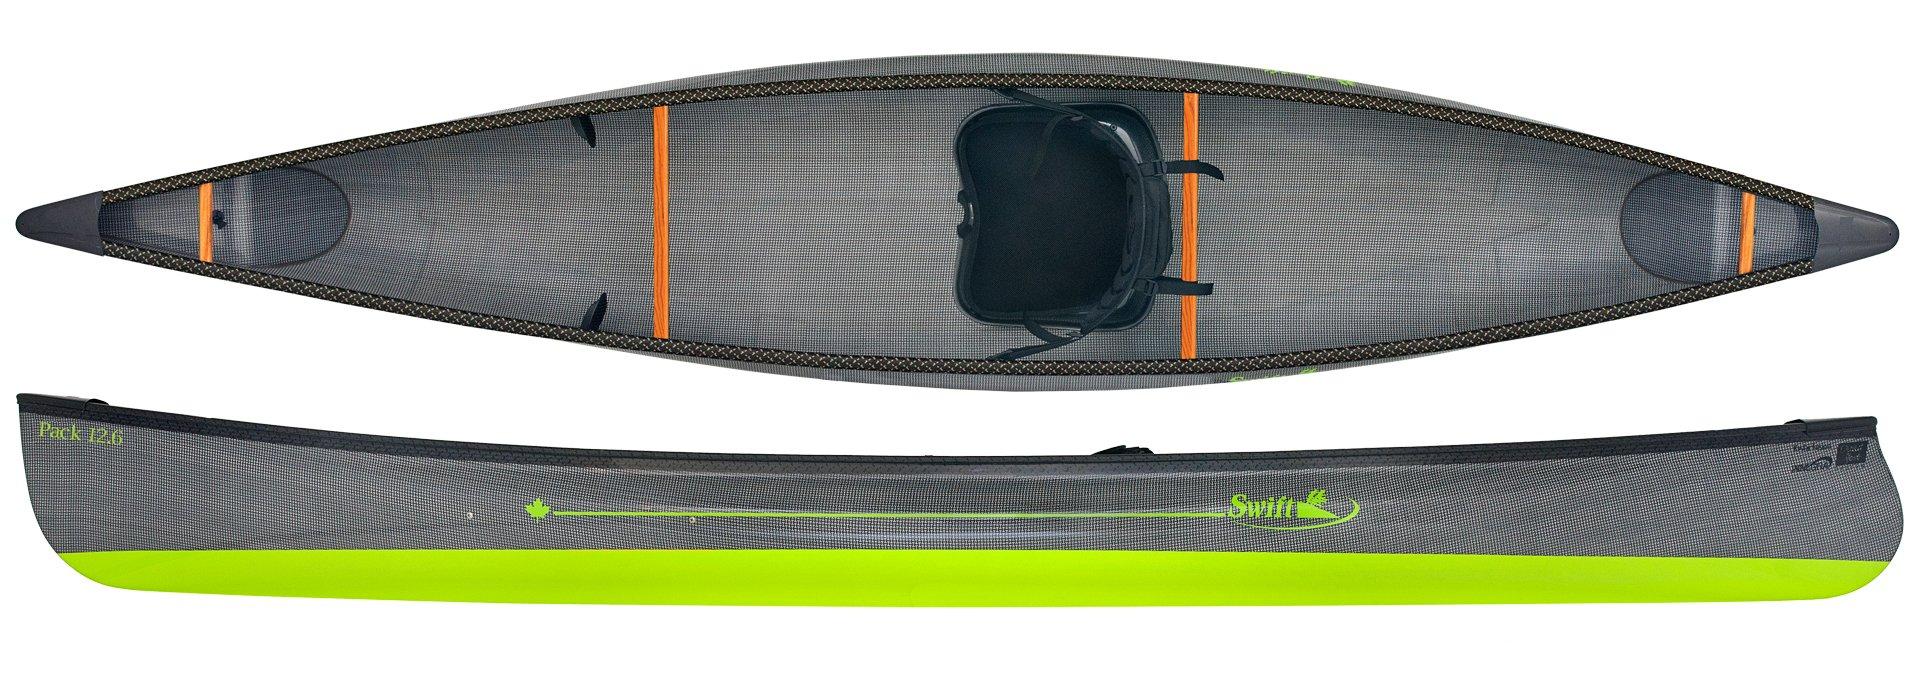 swift canoe & kayak carbon fusion